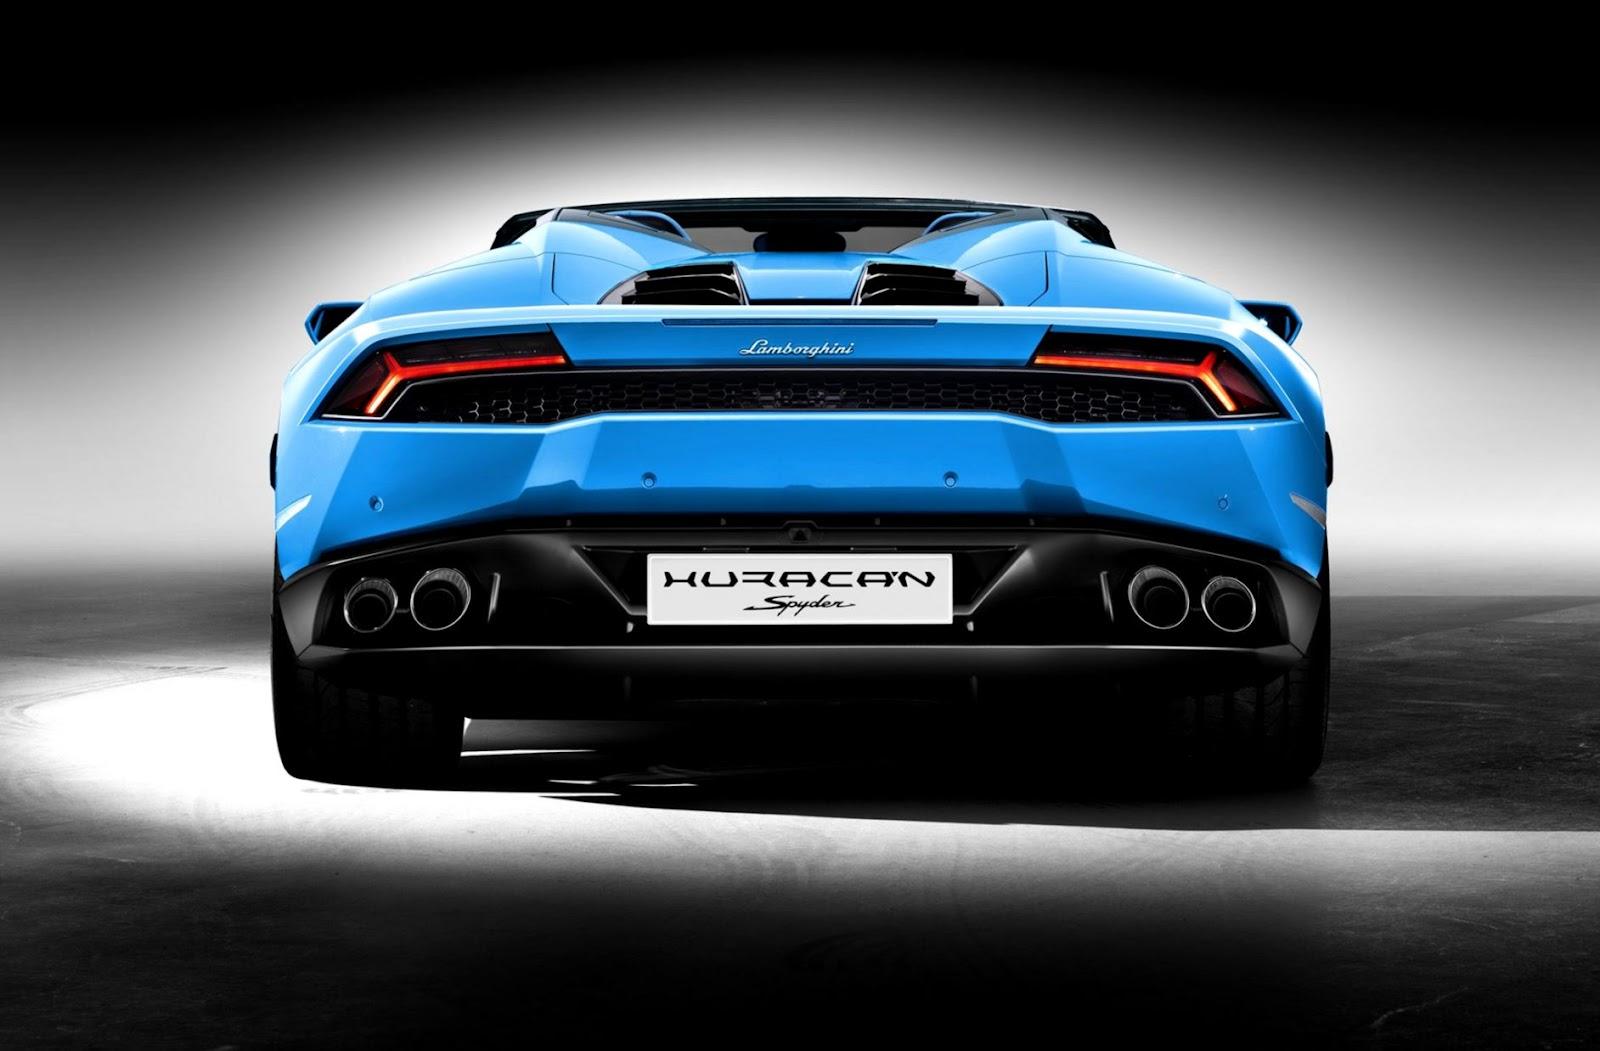 Lamborghini Huracan Rear End Wallpaper Wallpapers New